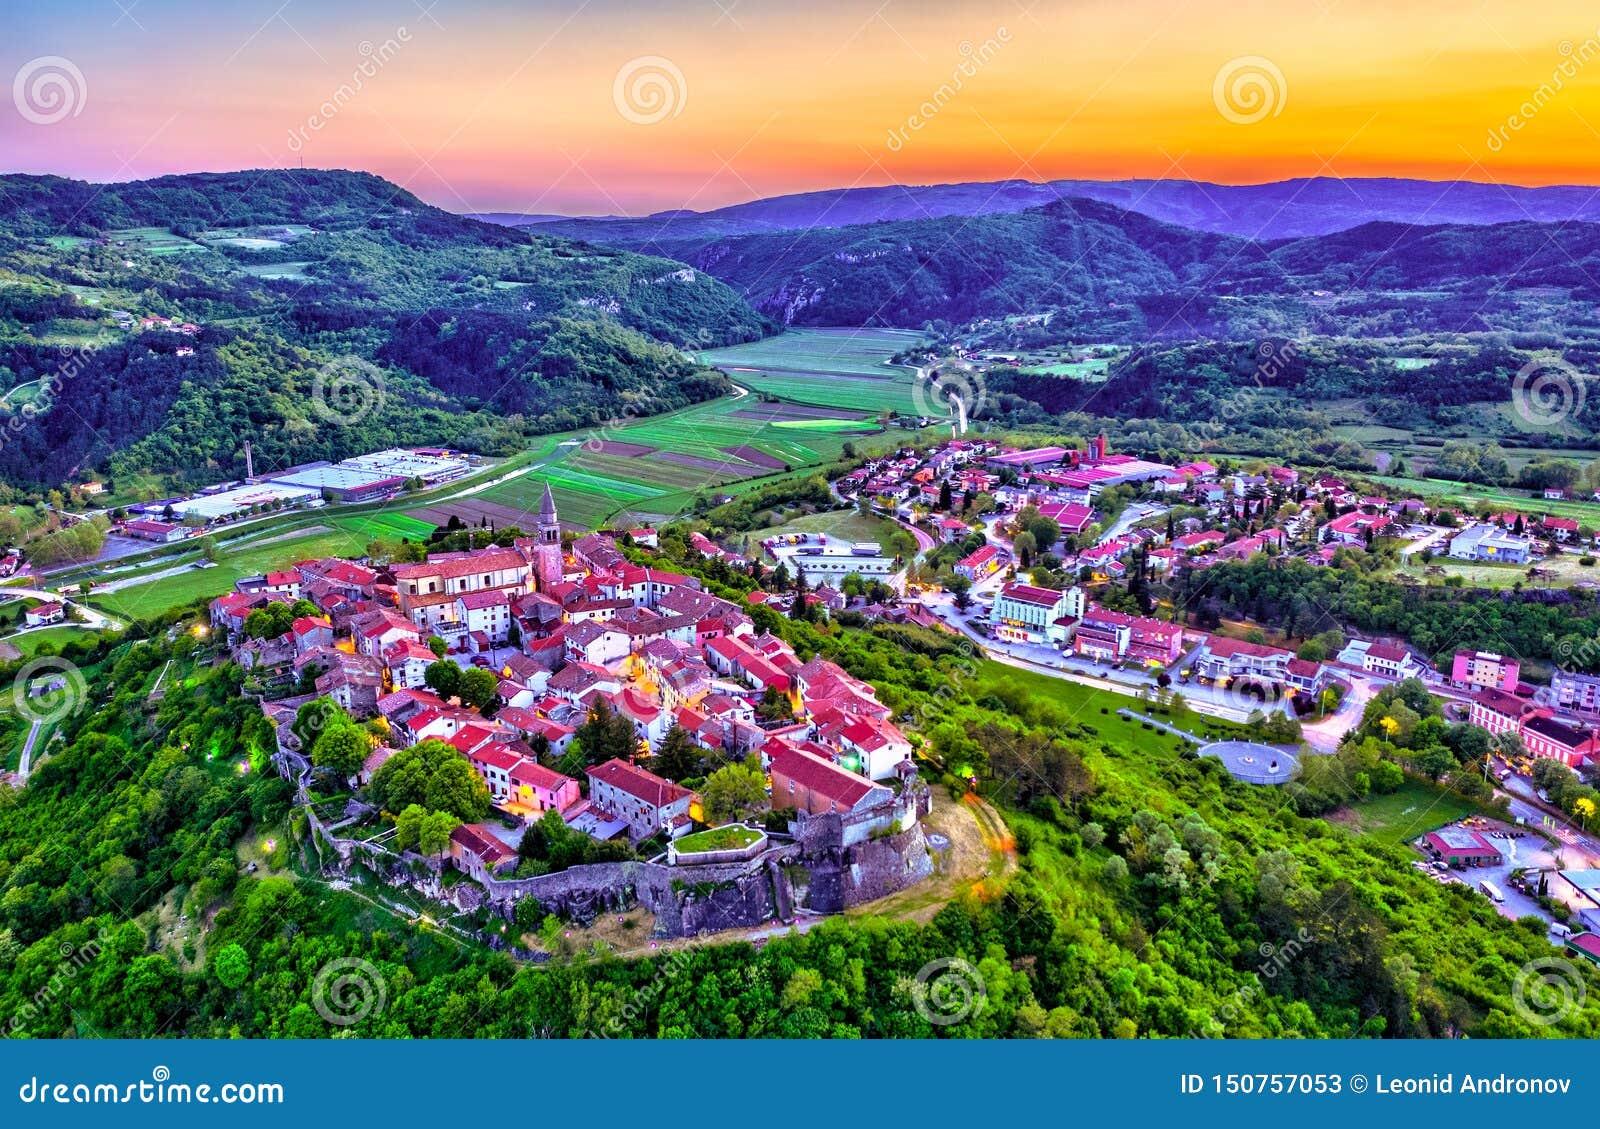 Aerial view of Buzet town in Istria, Croatia